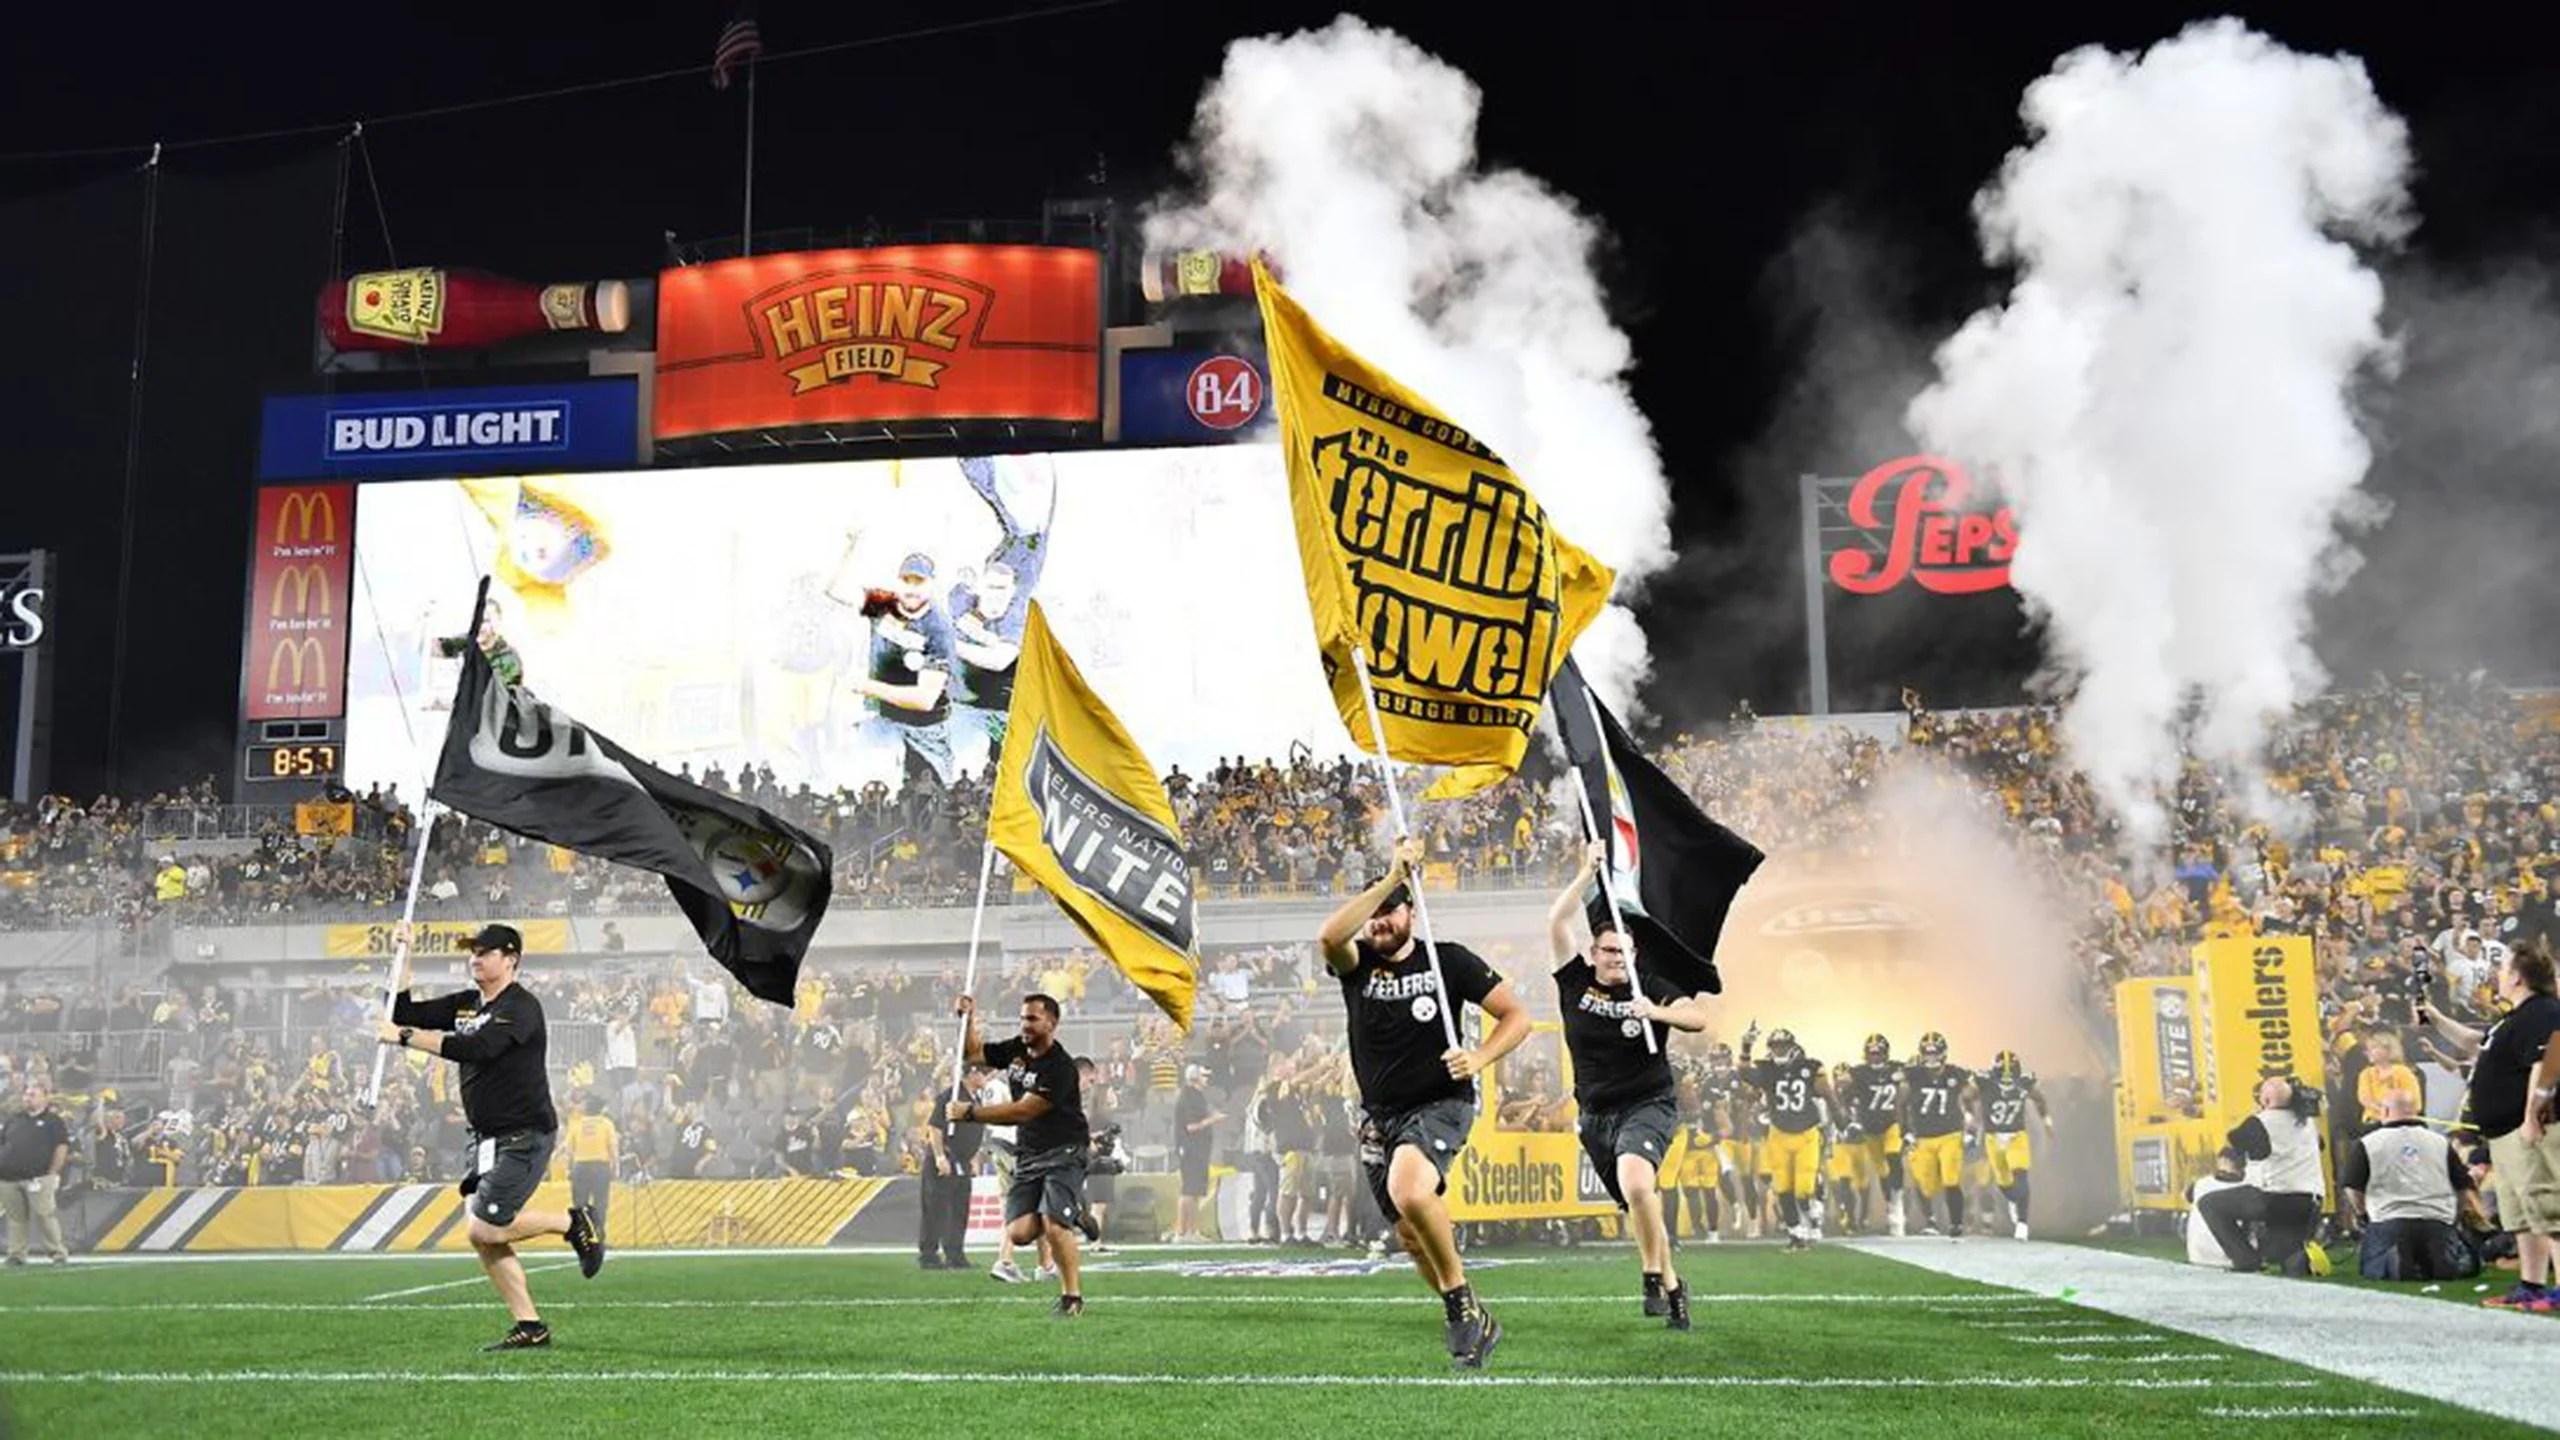 2020 pittsburgh steelers statistics & Steelers Tickets Pittsburgh Steelers Steelers Com